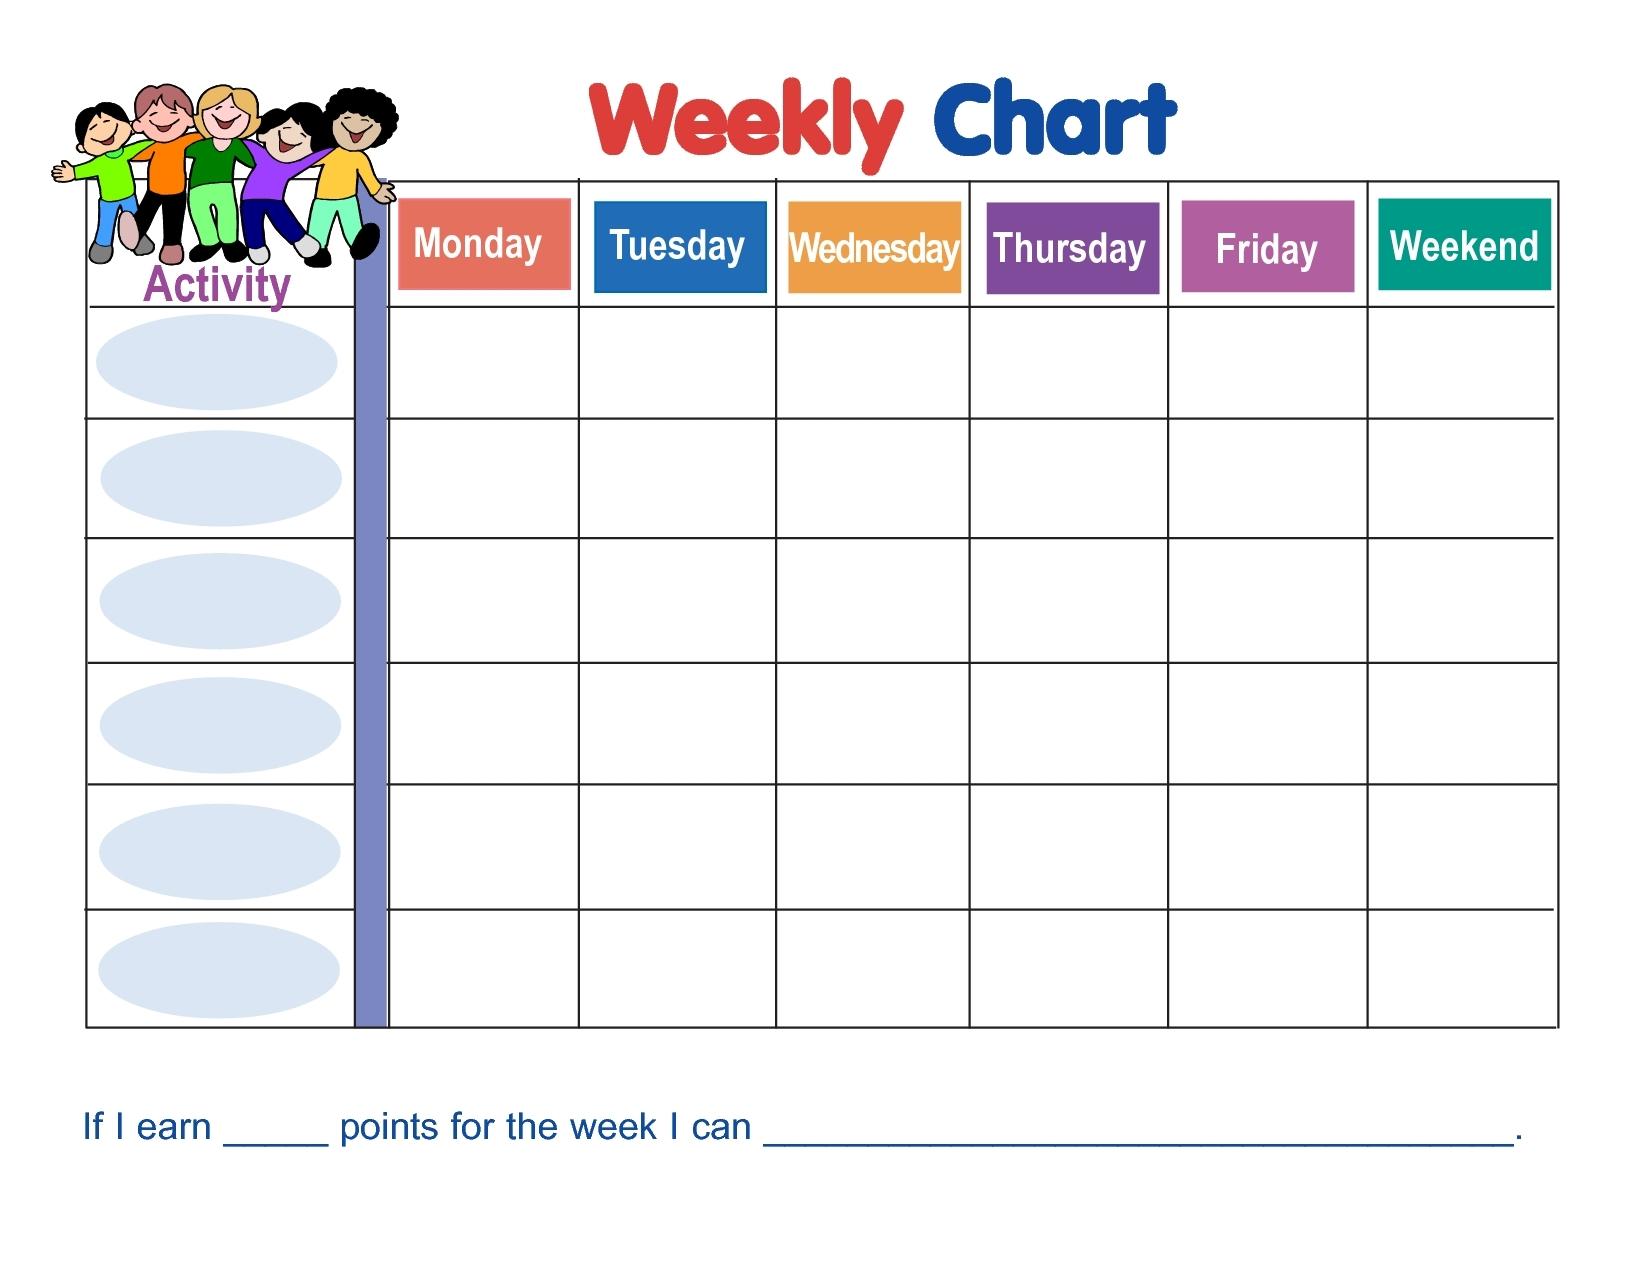 Printable Monday Through Friday Chart - Calendar Inspiration Design with Printable Calendar Weekly Mon - Fri Graphics